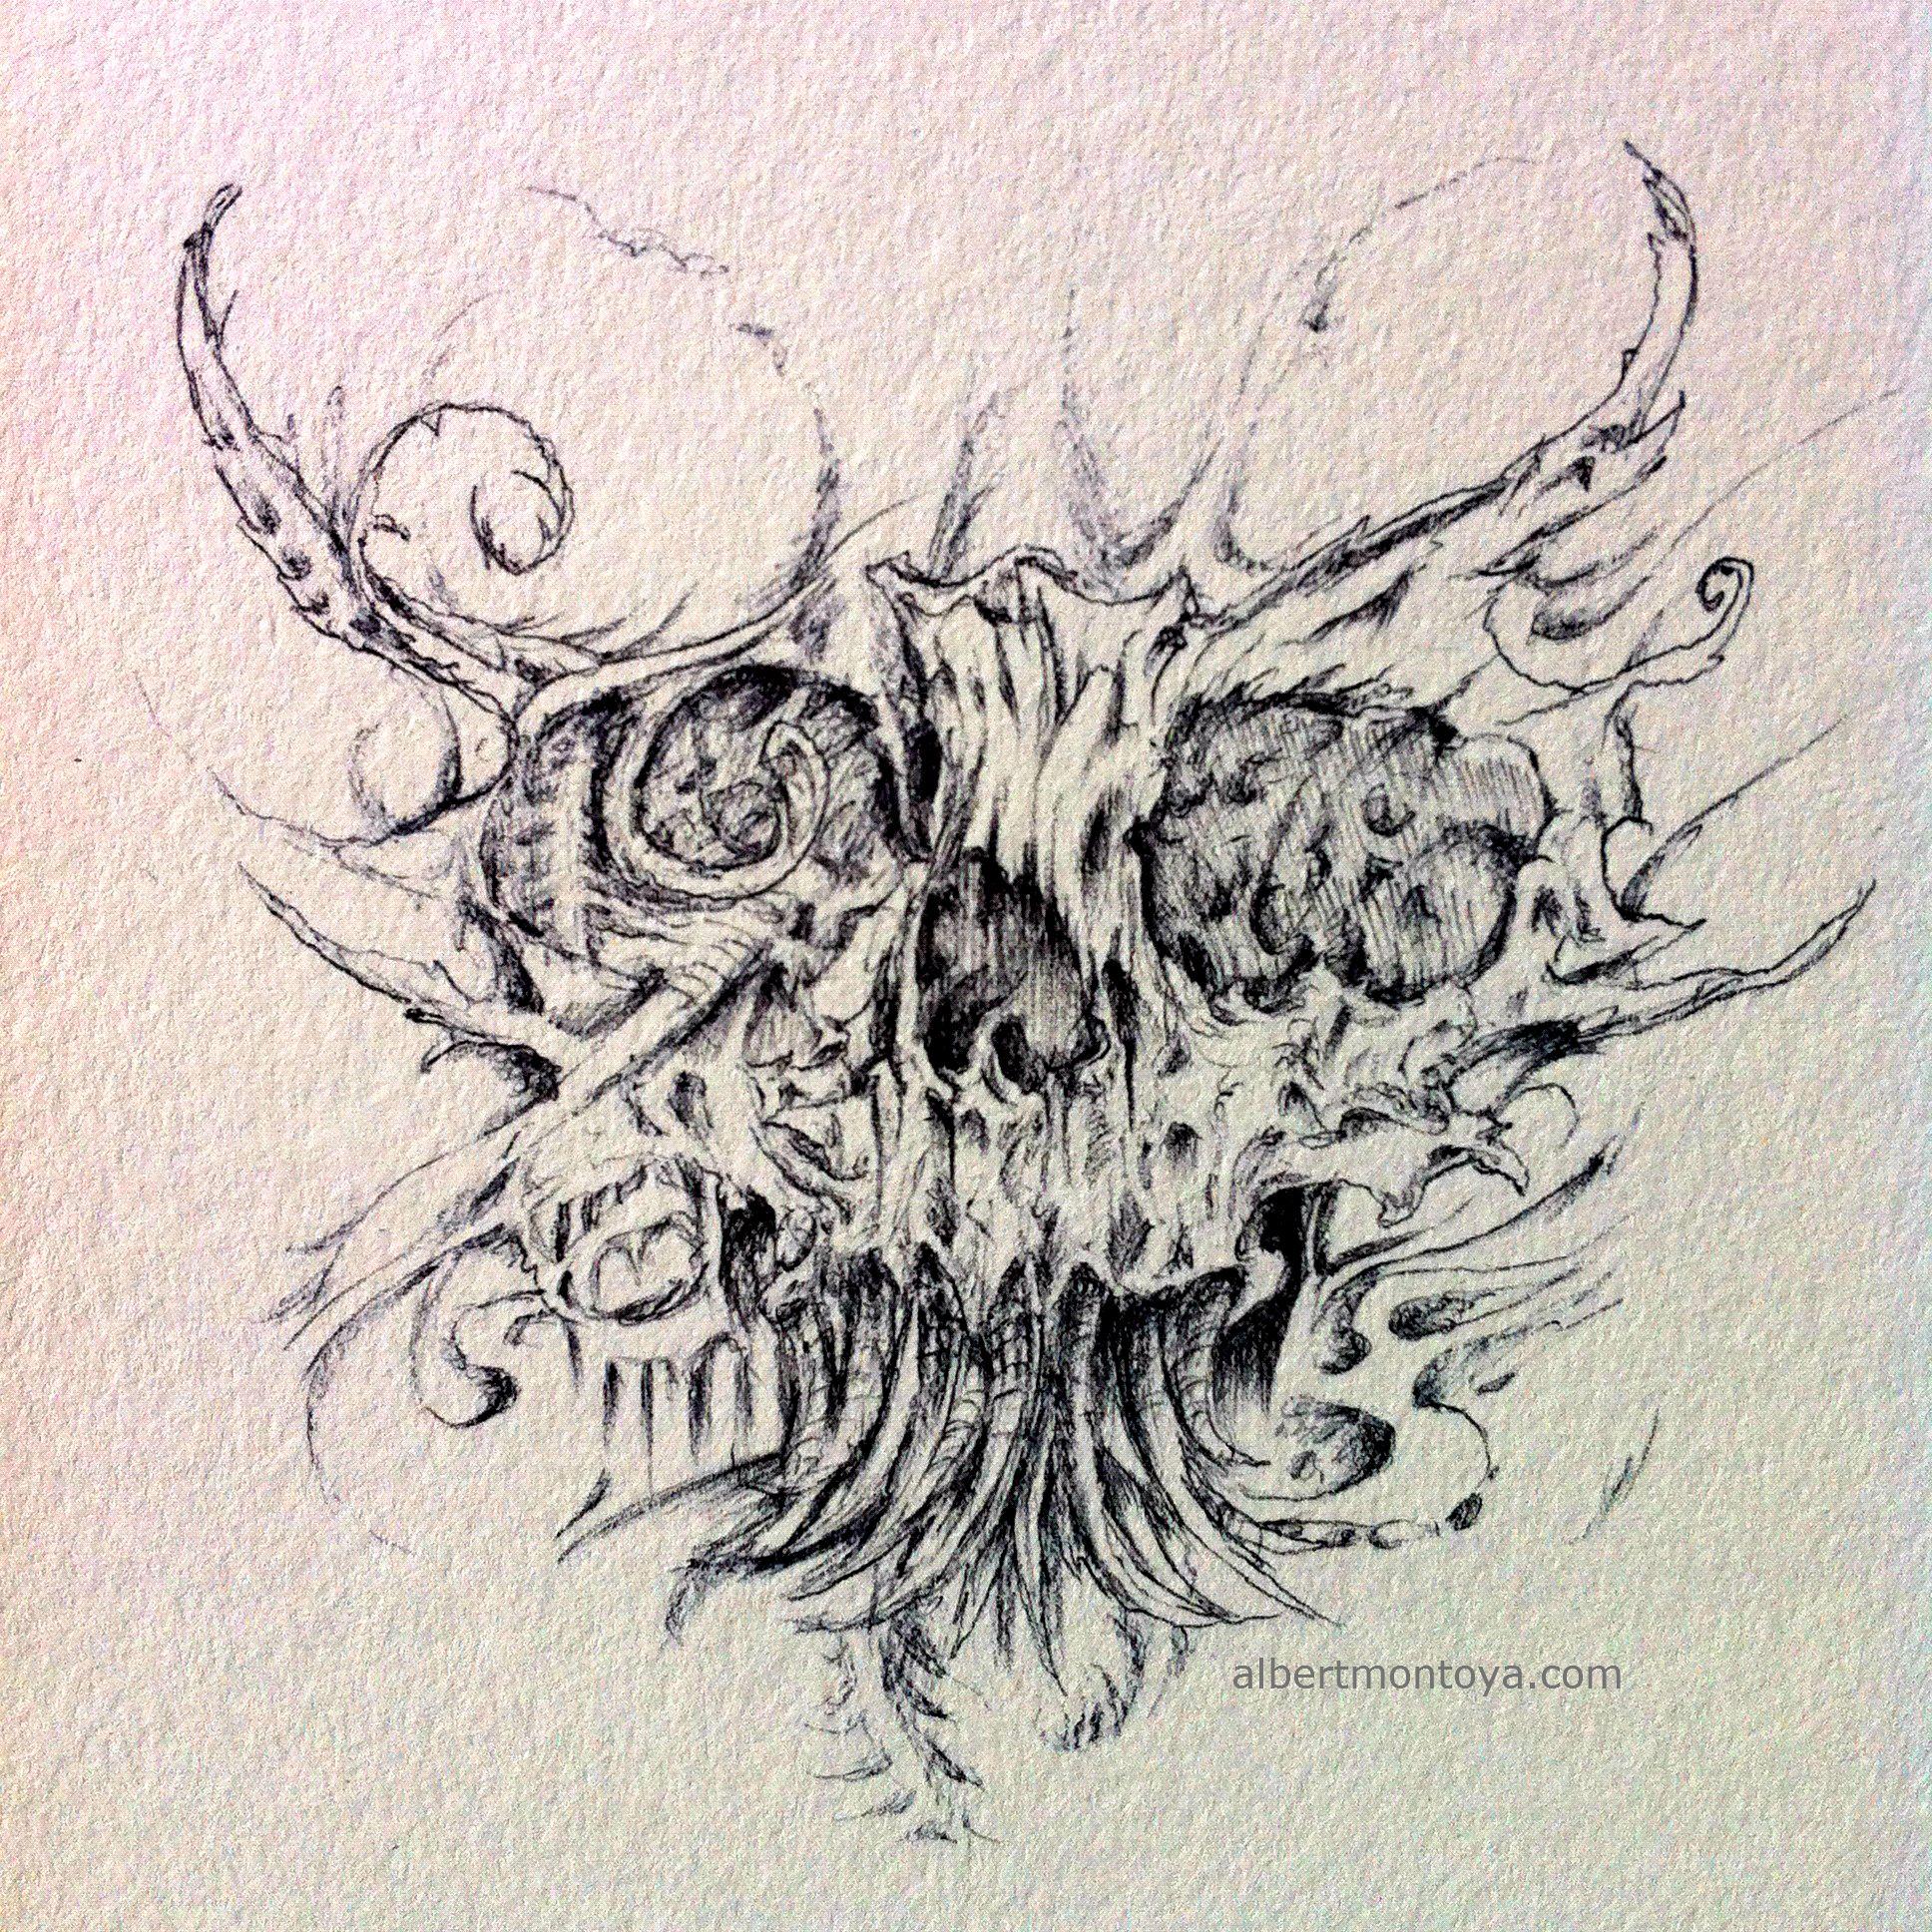 Ink Illustration On Paper By Albert Montoya